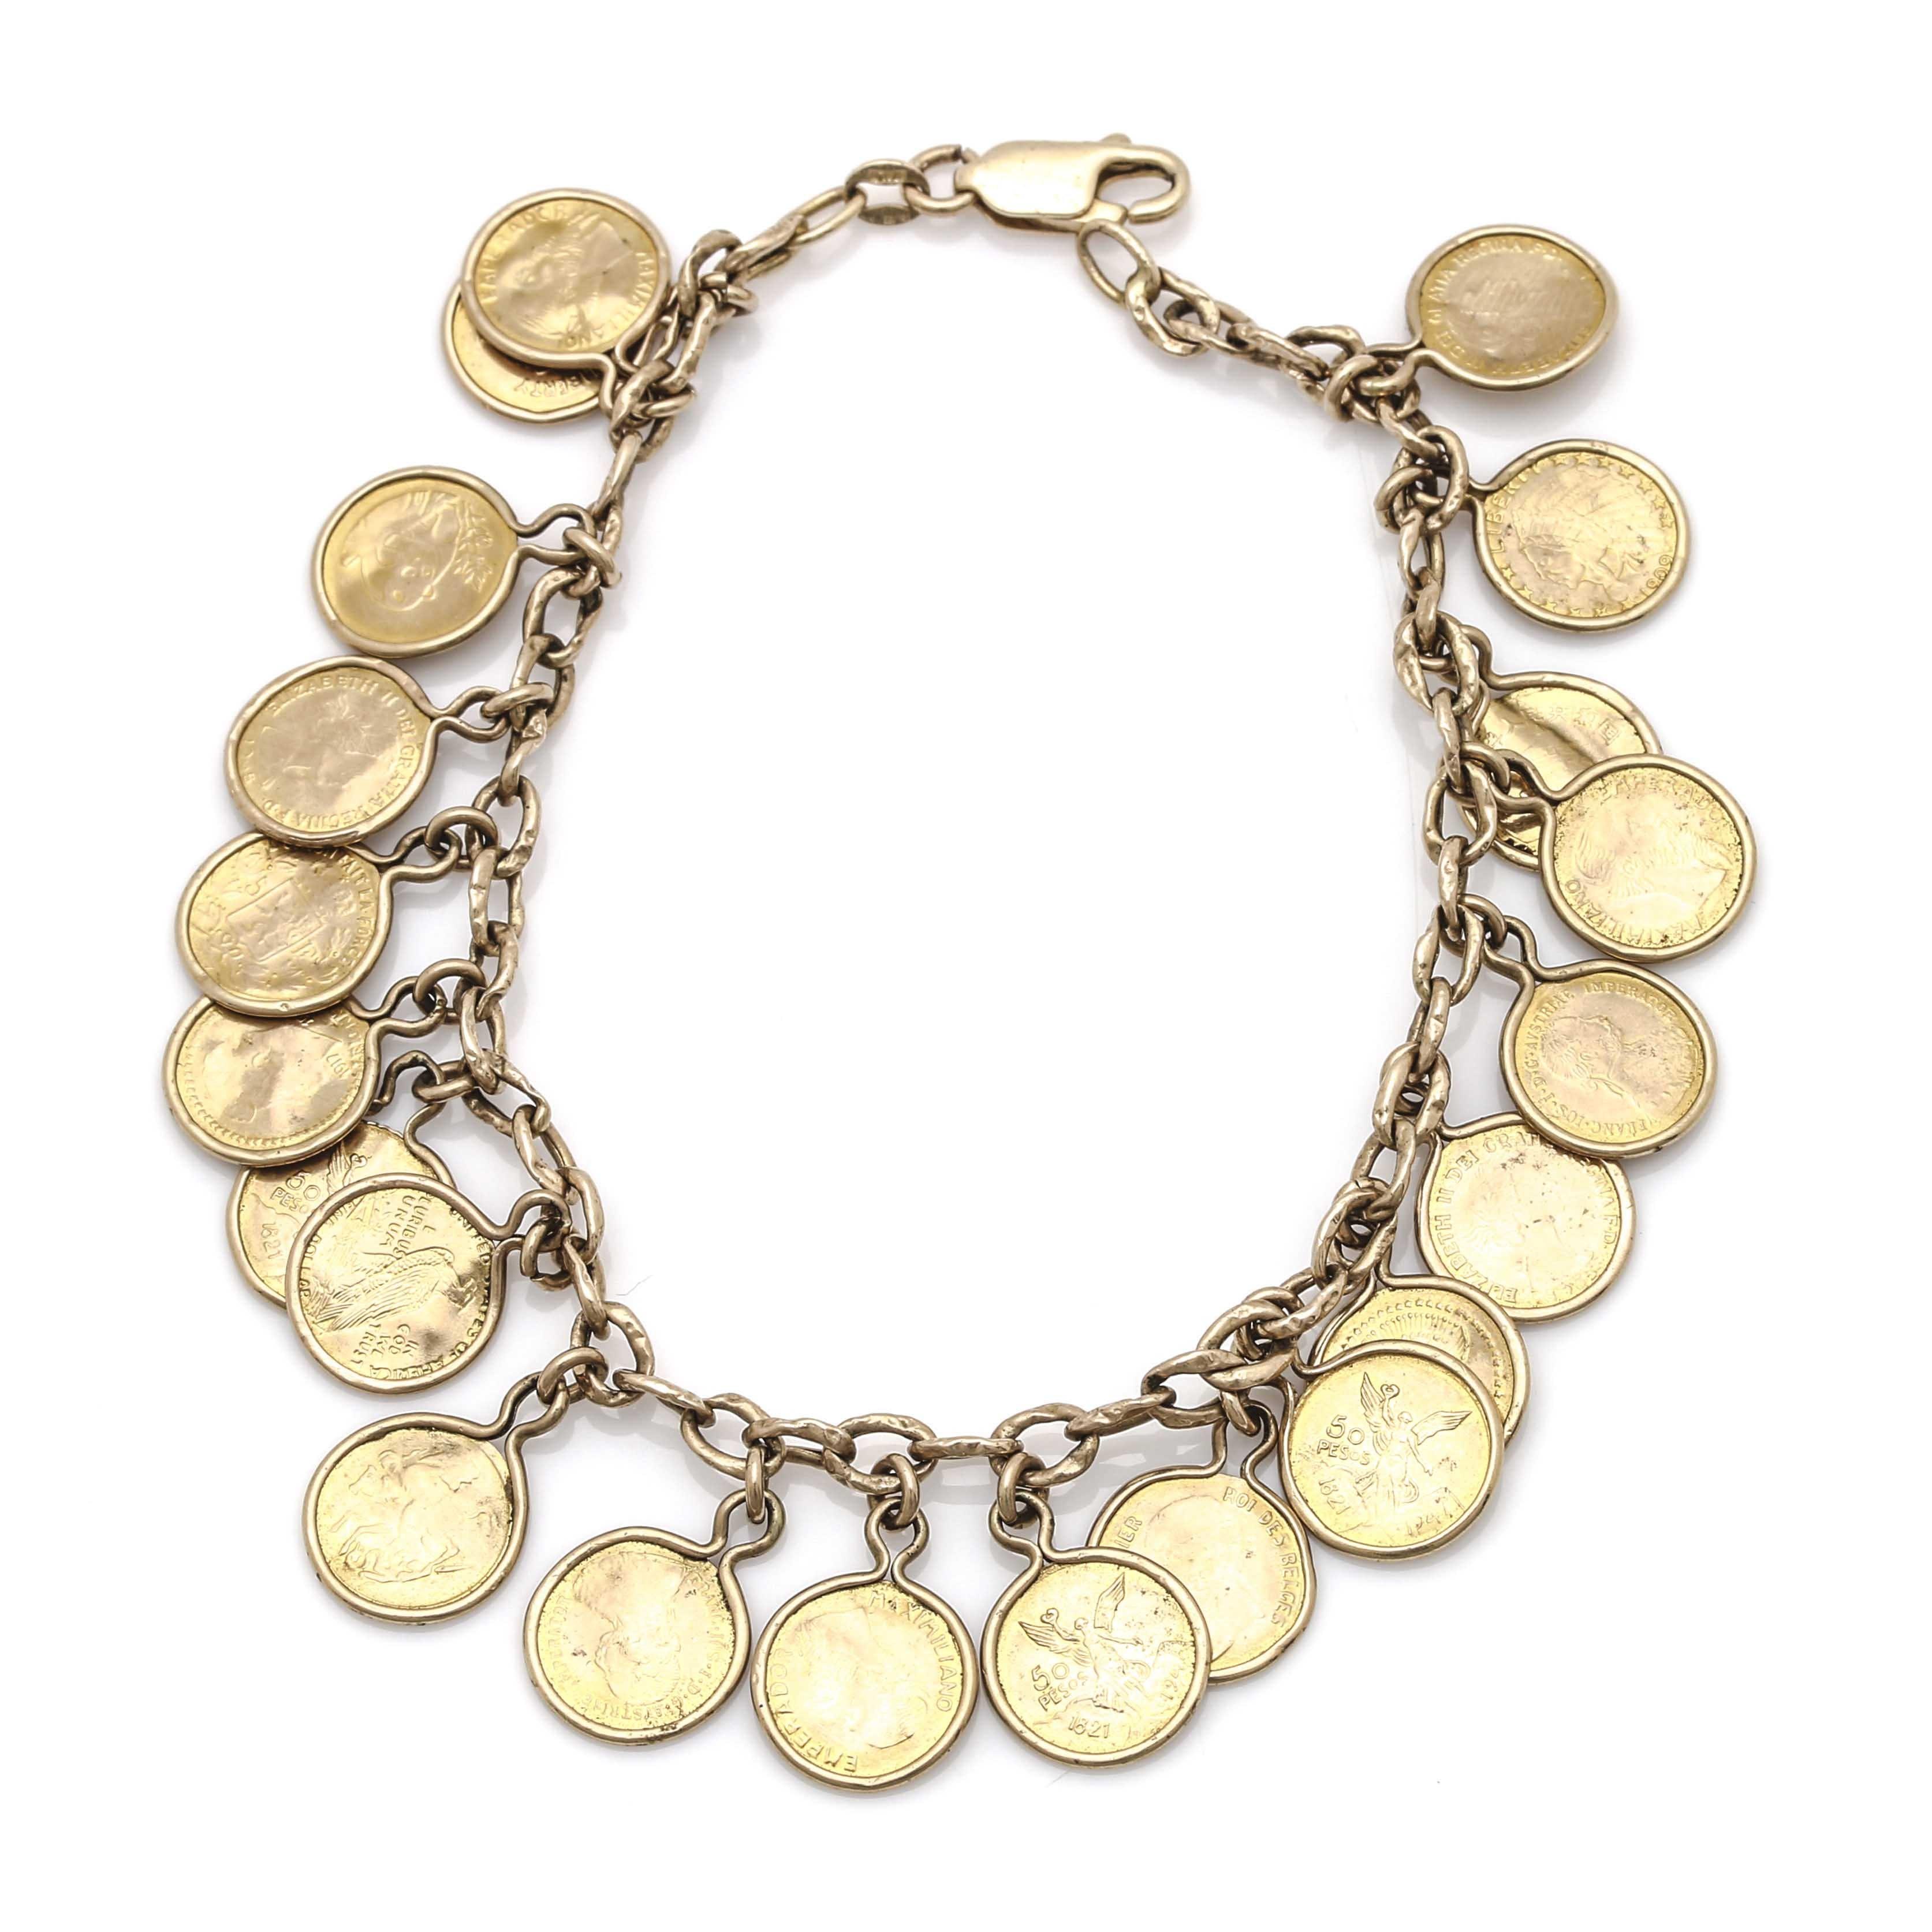 14K Yellow Gold Replica Coin Bracelet